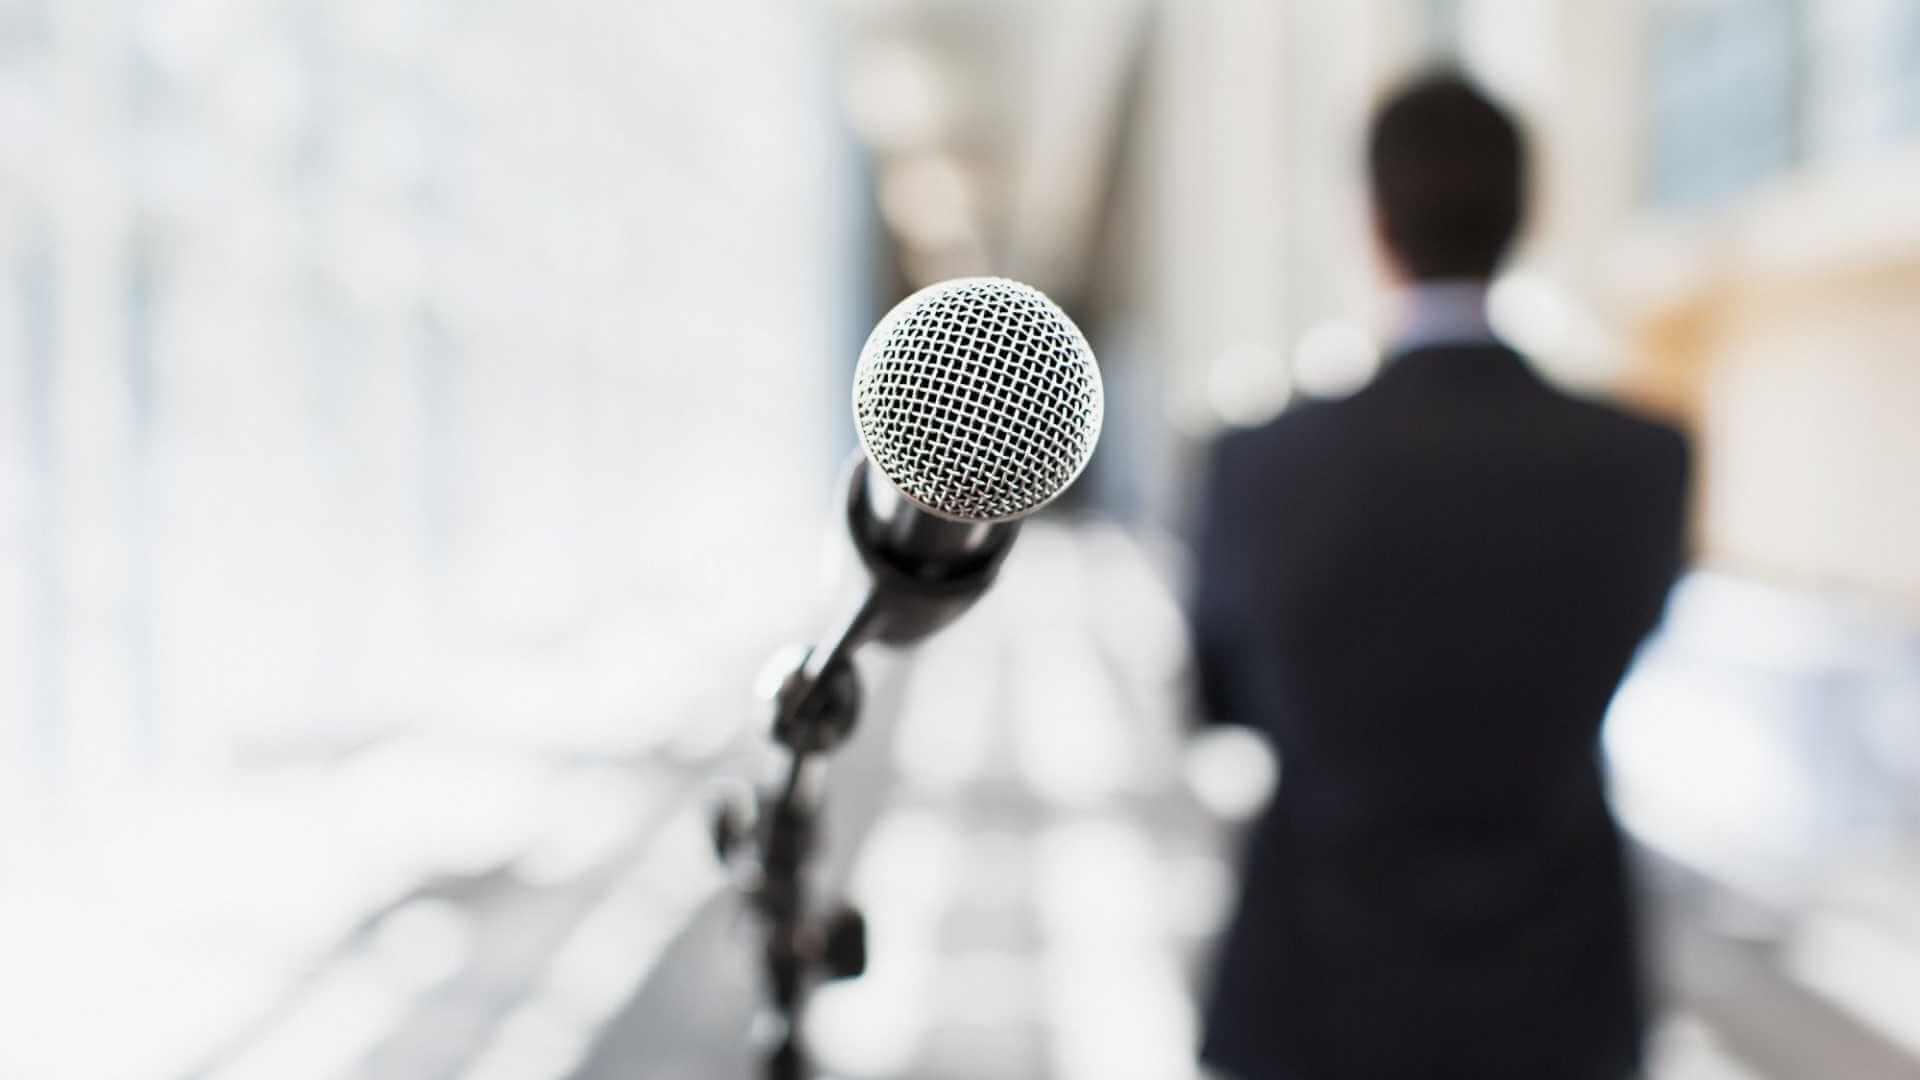 6 Ways to Calm Your Nerves Before Hosting a Big Event